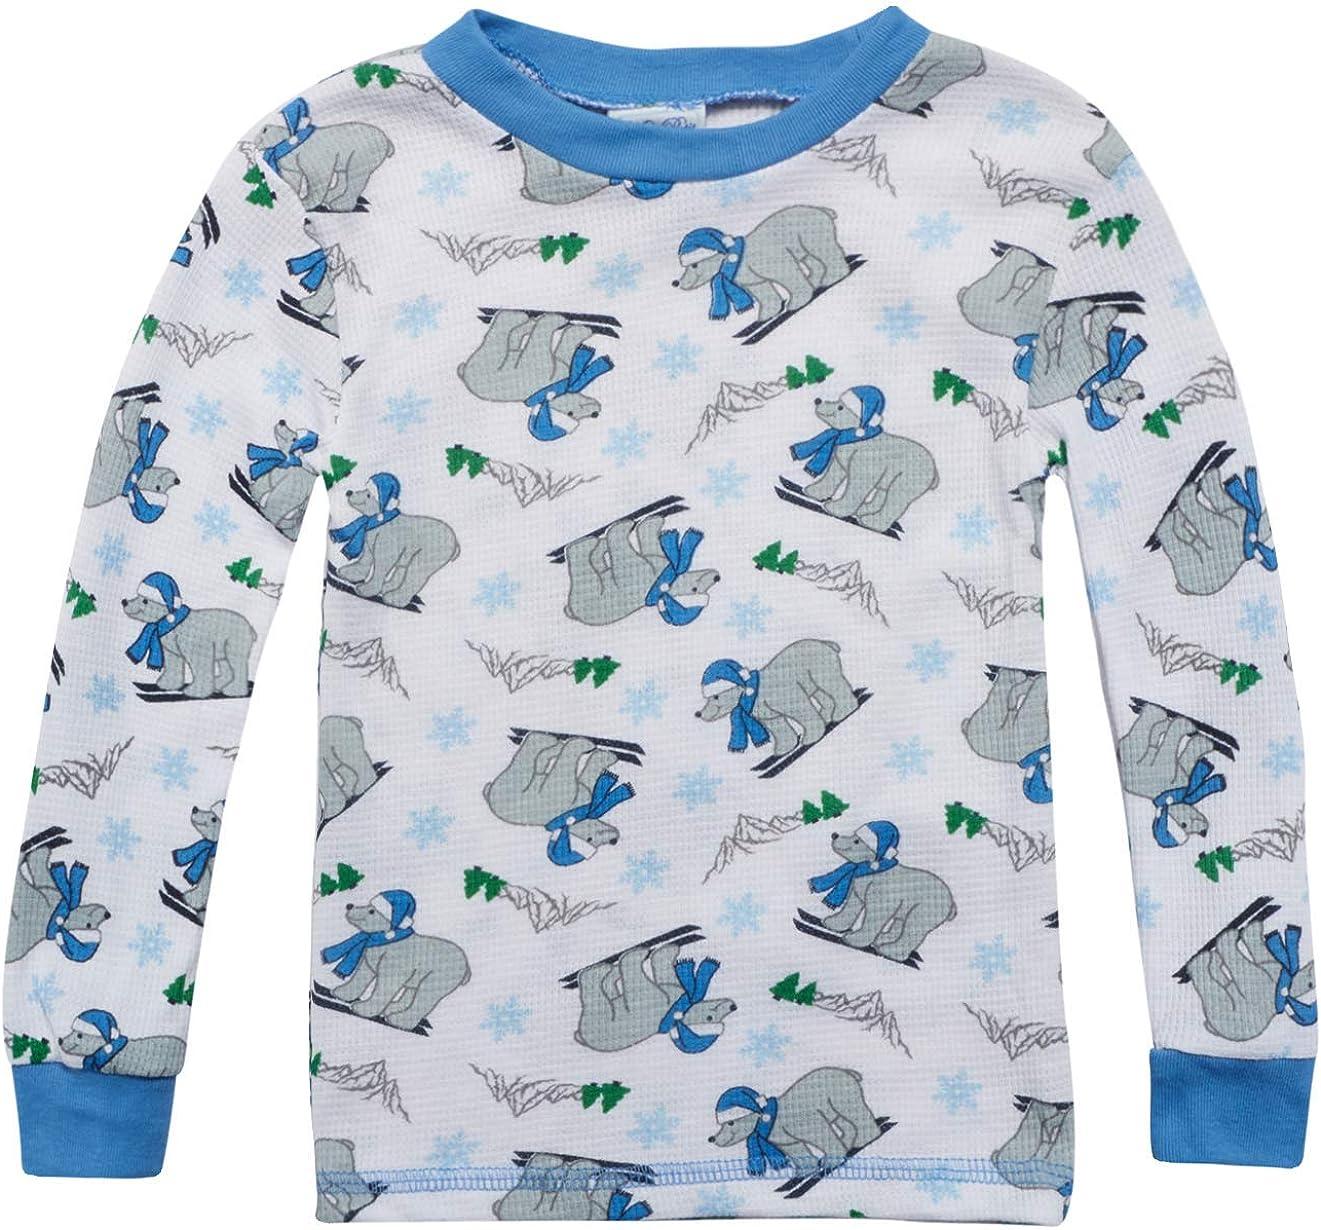 Infant /& Toddler 2-Pack Mon Petit Baby Boys /& Girls Thermal Pajama Pant Sets with Fun Prints